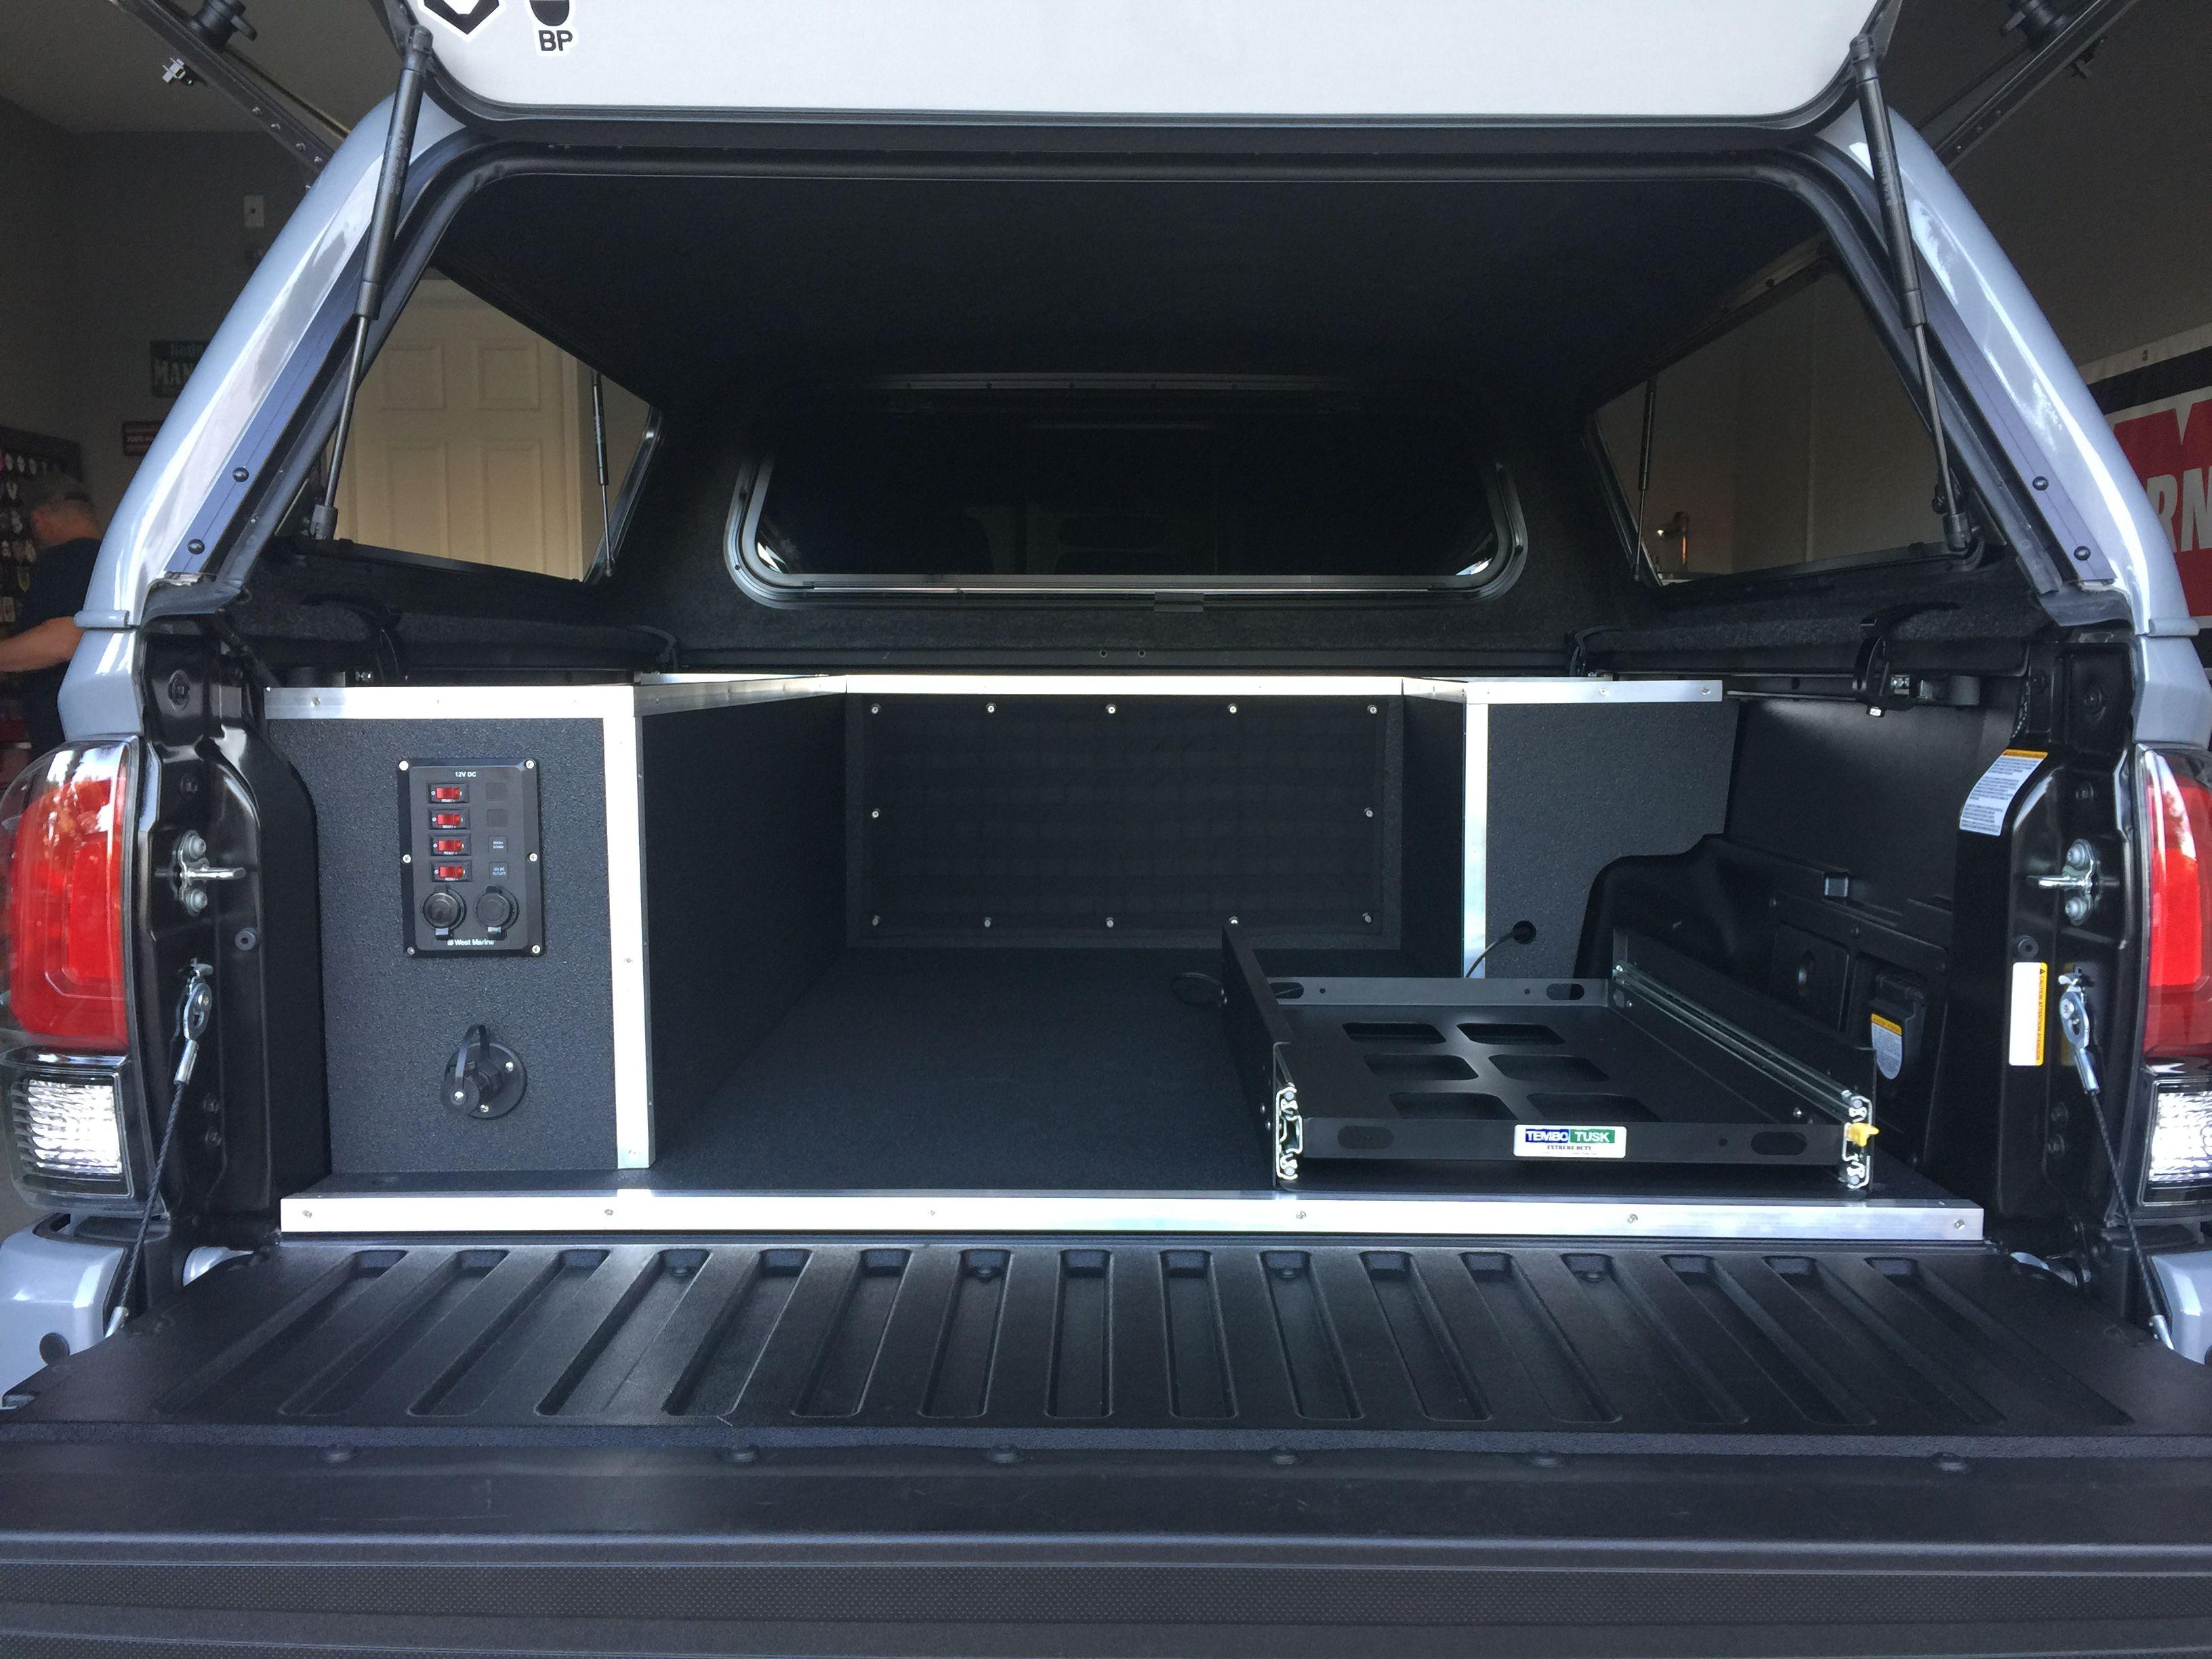 2017 Toyota TRD PRO custom truck bed storage